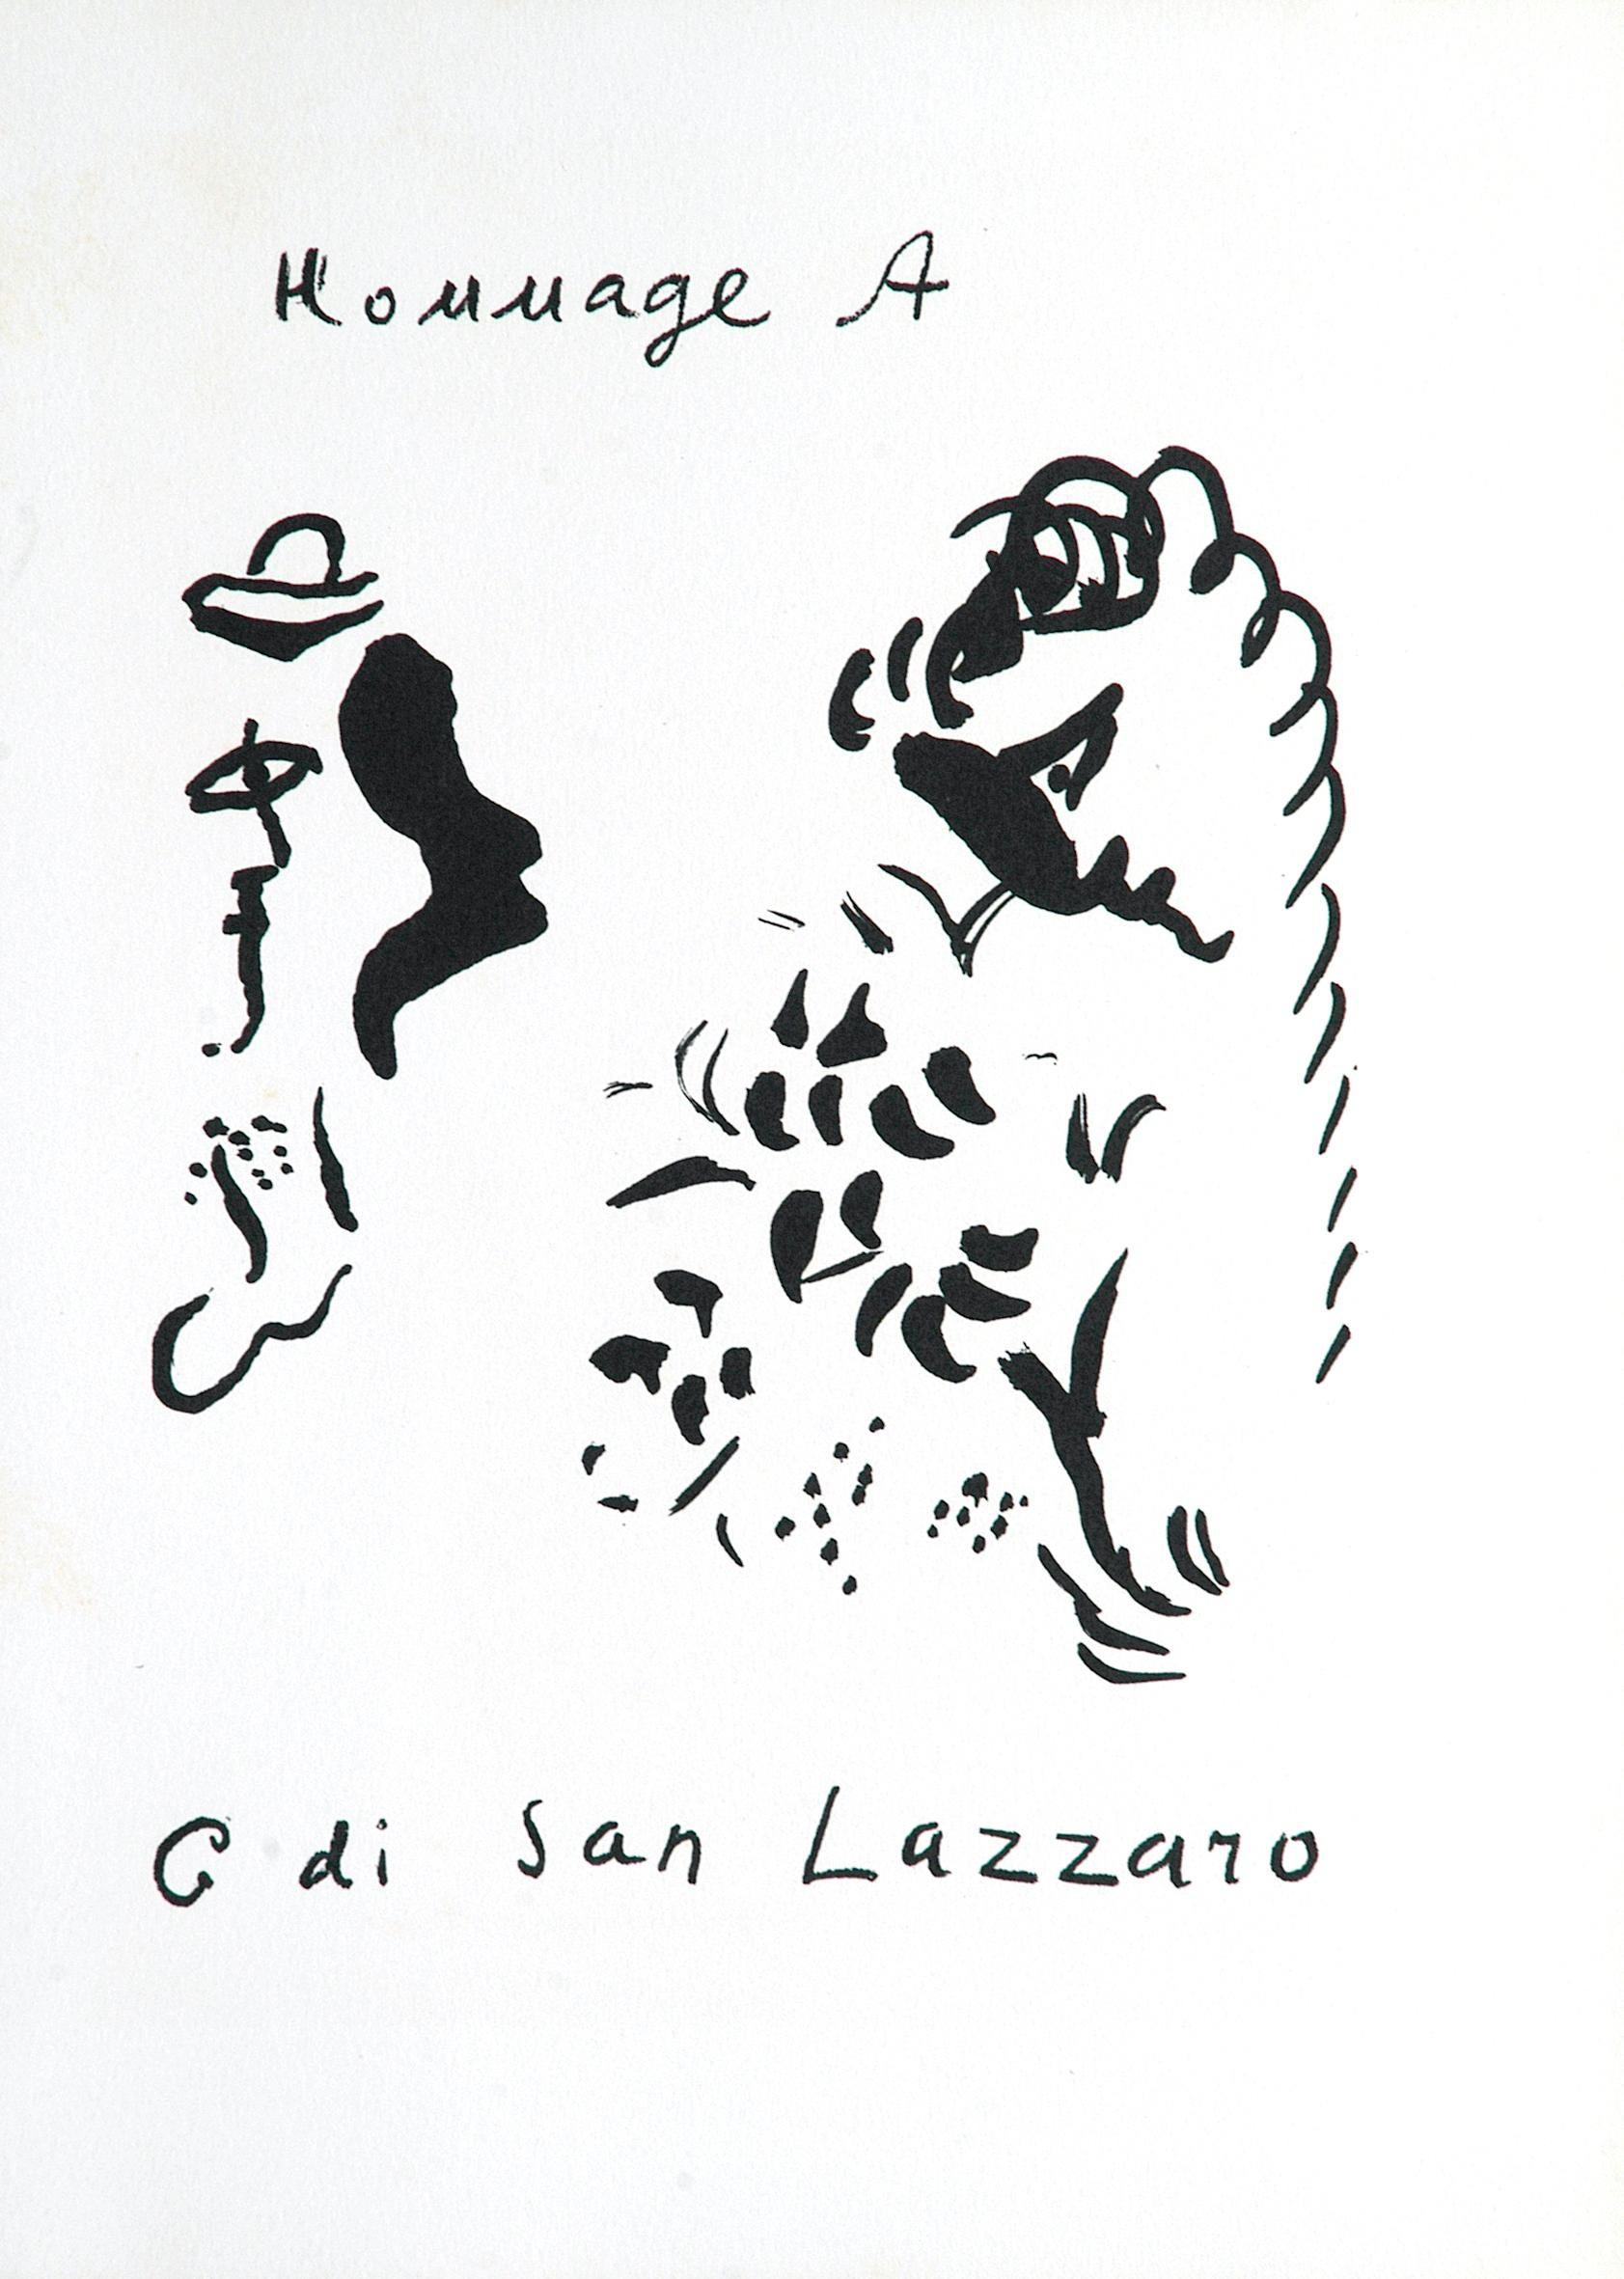 Hommage à San Lazzaro - Original Lithograph by M. Chagall - 1975